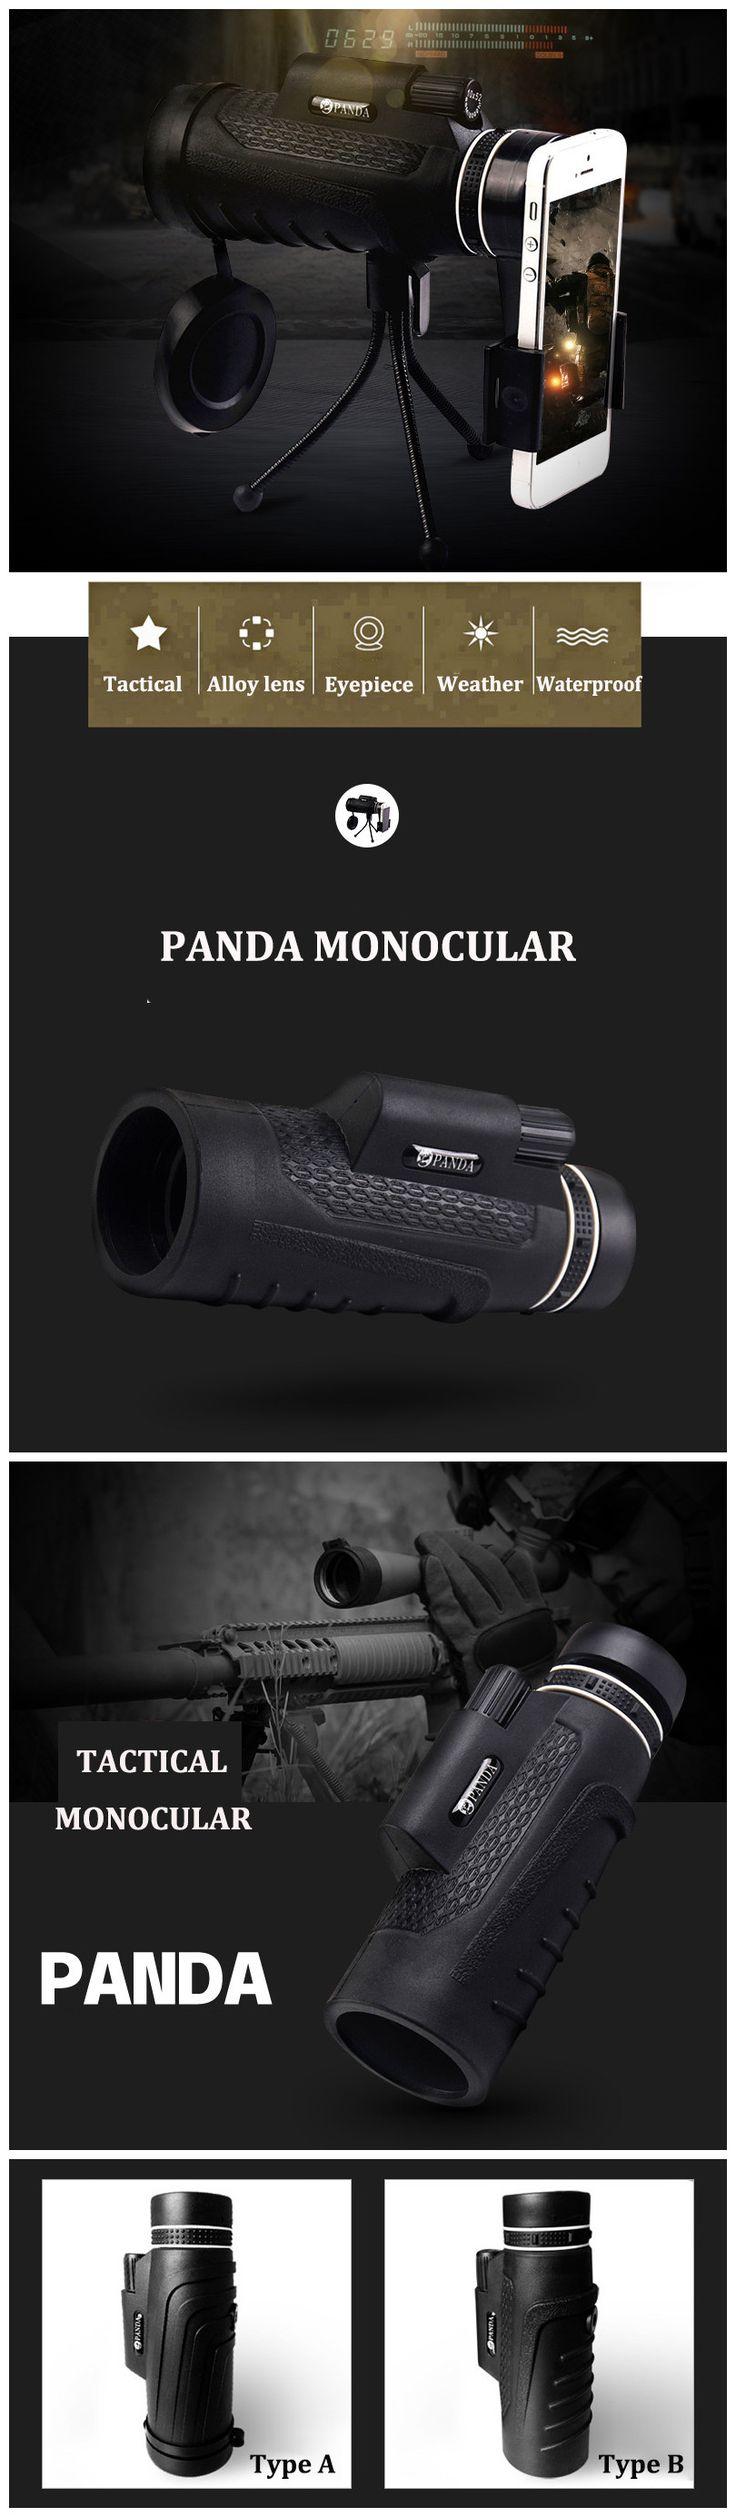 PANDA 20X60 HD BAK4 Monocular Clear Night Vision Optic Lens Telescope With Tripod Outdoor Travel